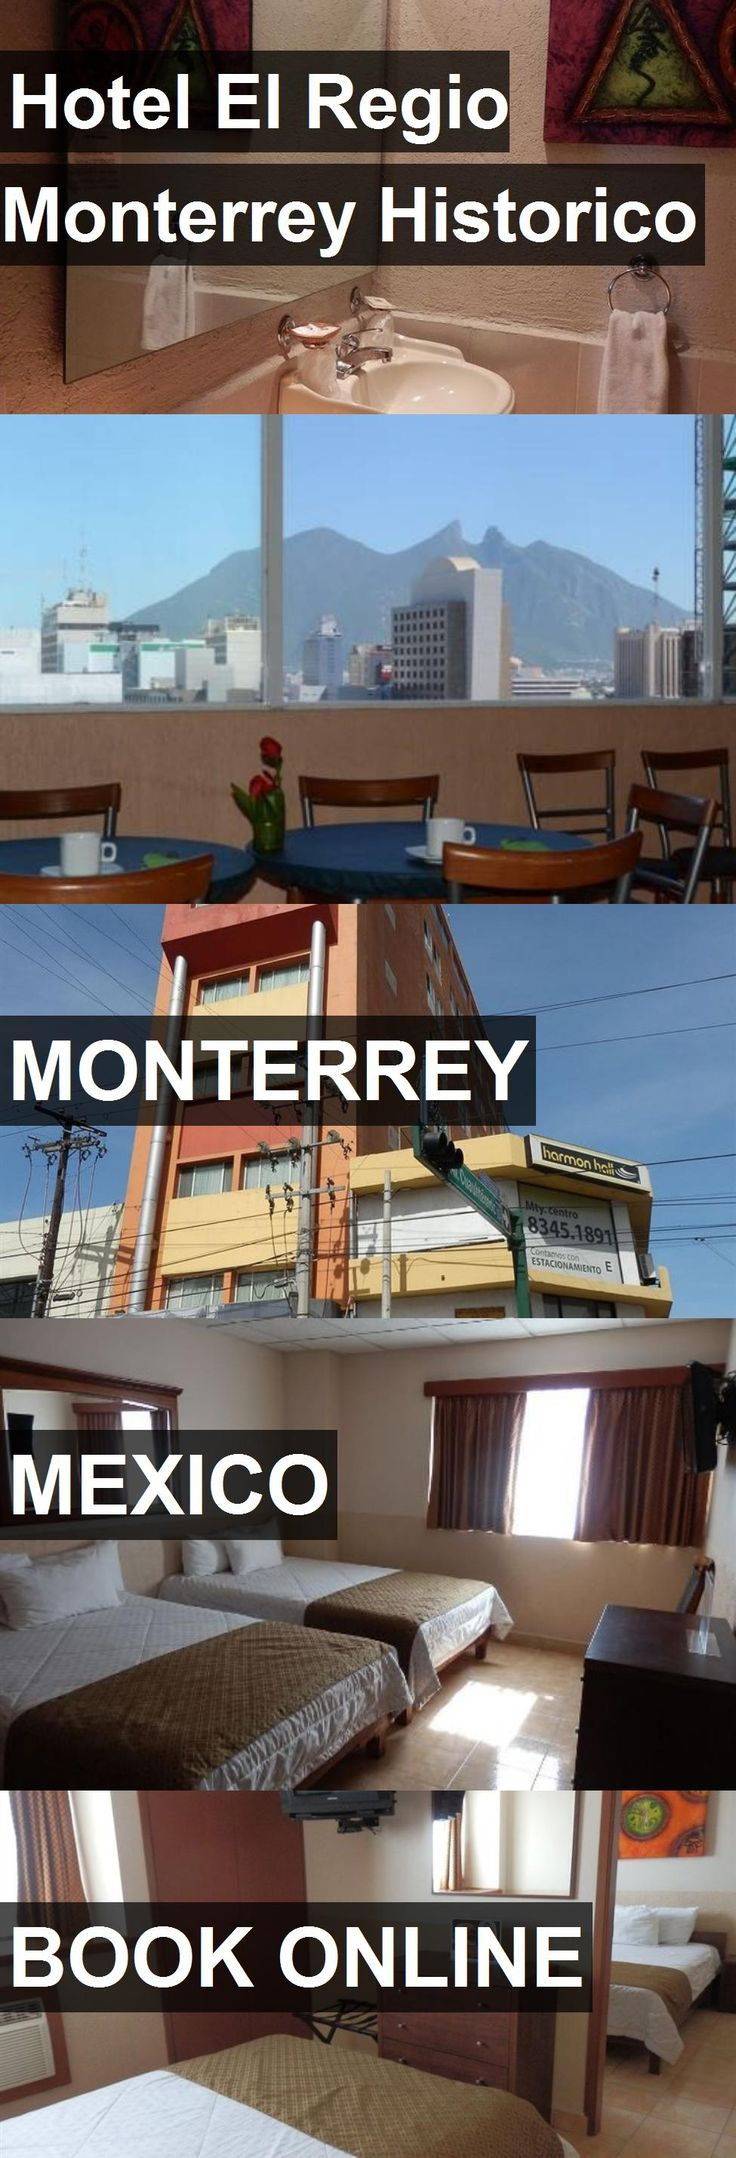 Hotel Hotel El Regio Monterrey Historico in Monterrey, Mexico. For more information, photos, reviews and best prices please follow the link. #Mexico #Monterrey #hotel #travel #vacation